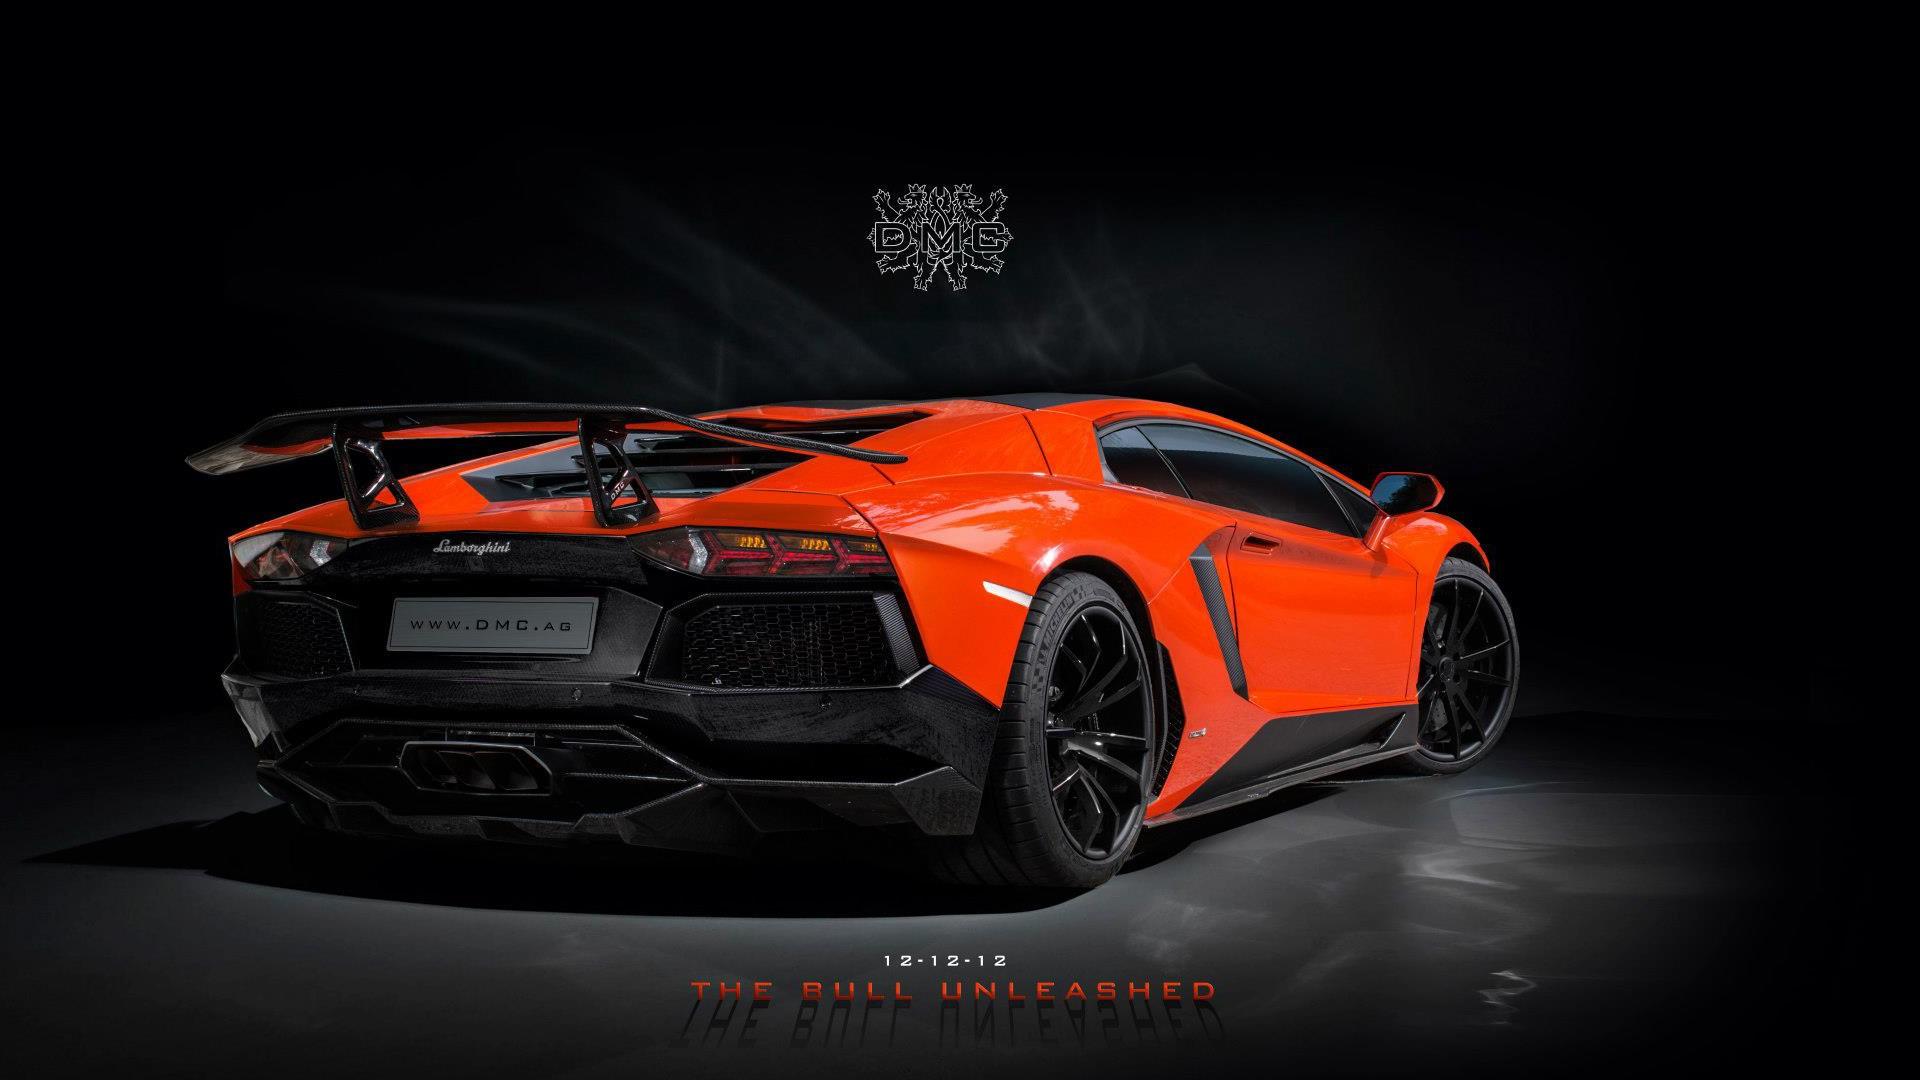 Luxury Cars Hd Wallpapers Download Dmc Tuning 2013 Lamborghini Aventador Lp900 Sv 2 Wallpaper